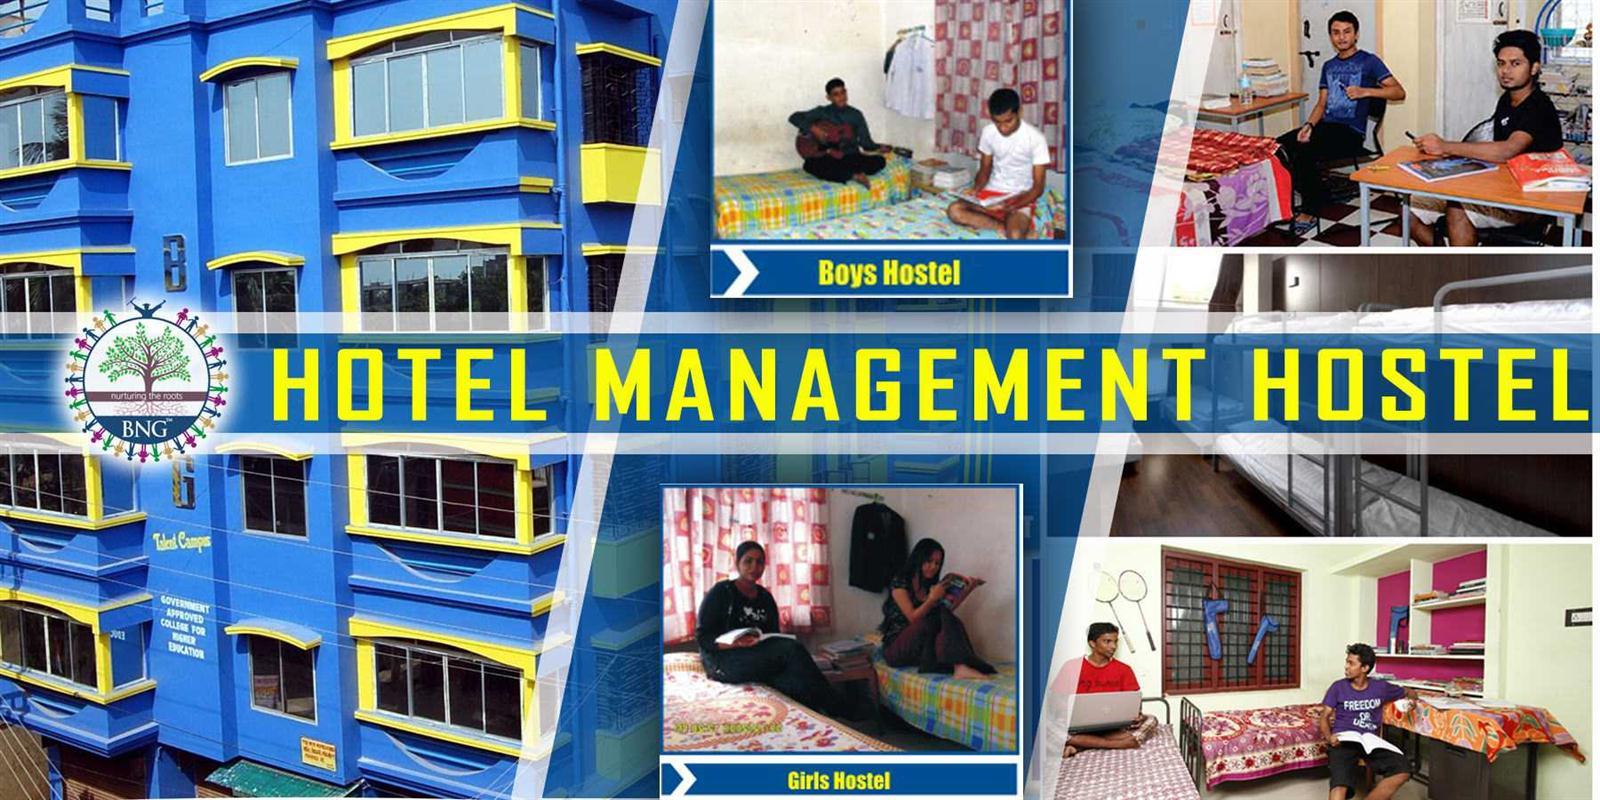 hotel management hostel of BNG Hotel management kolkata